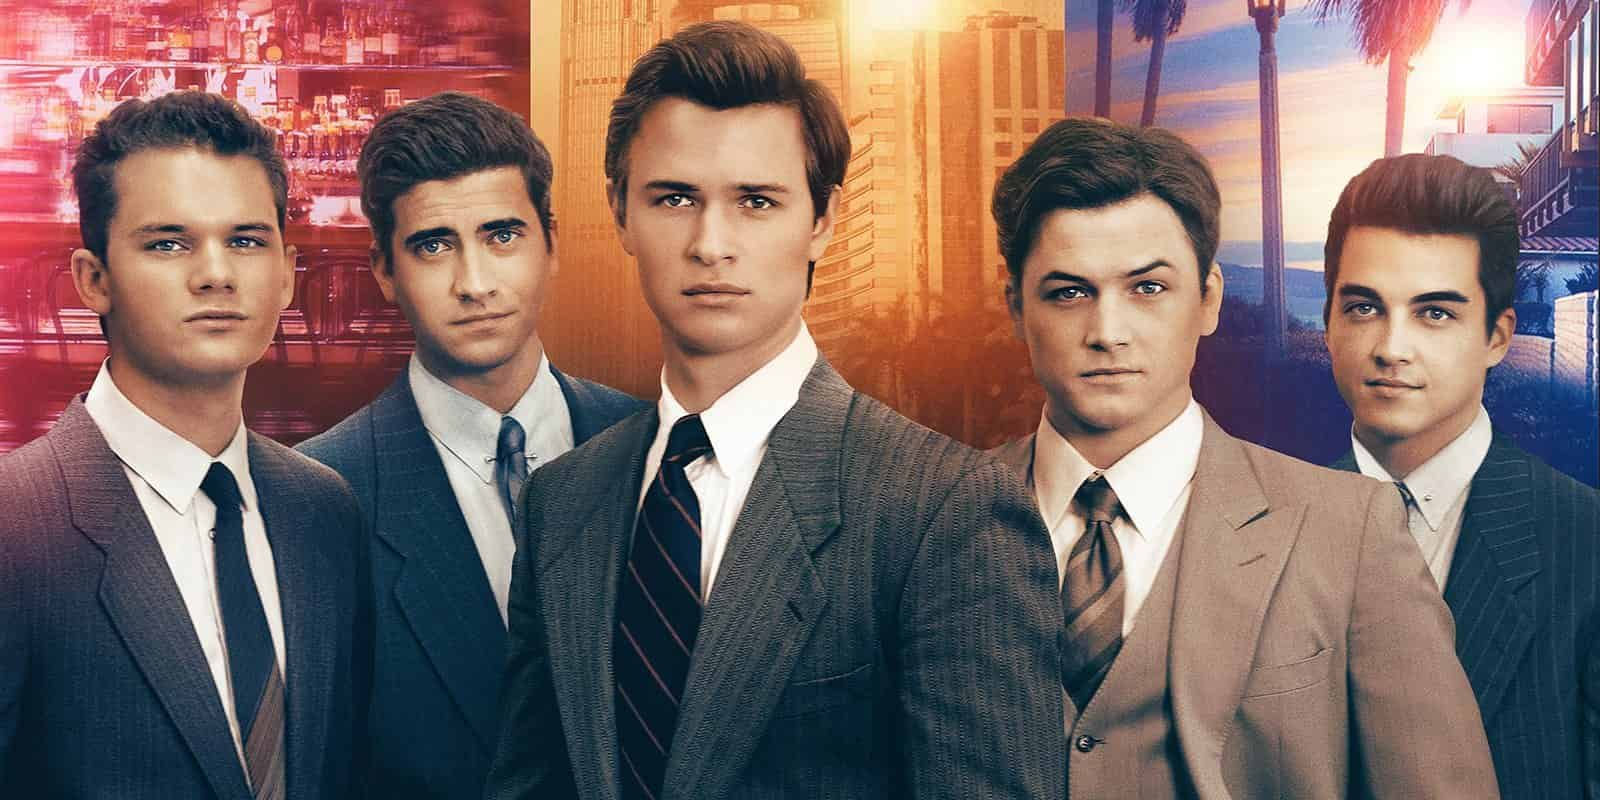 Movies for entrepreneurs #52: Billionaire Boys Club